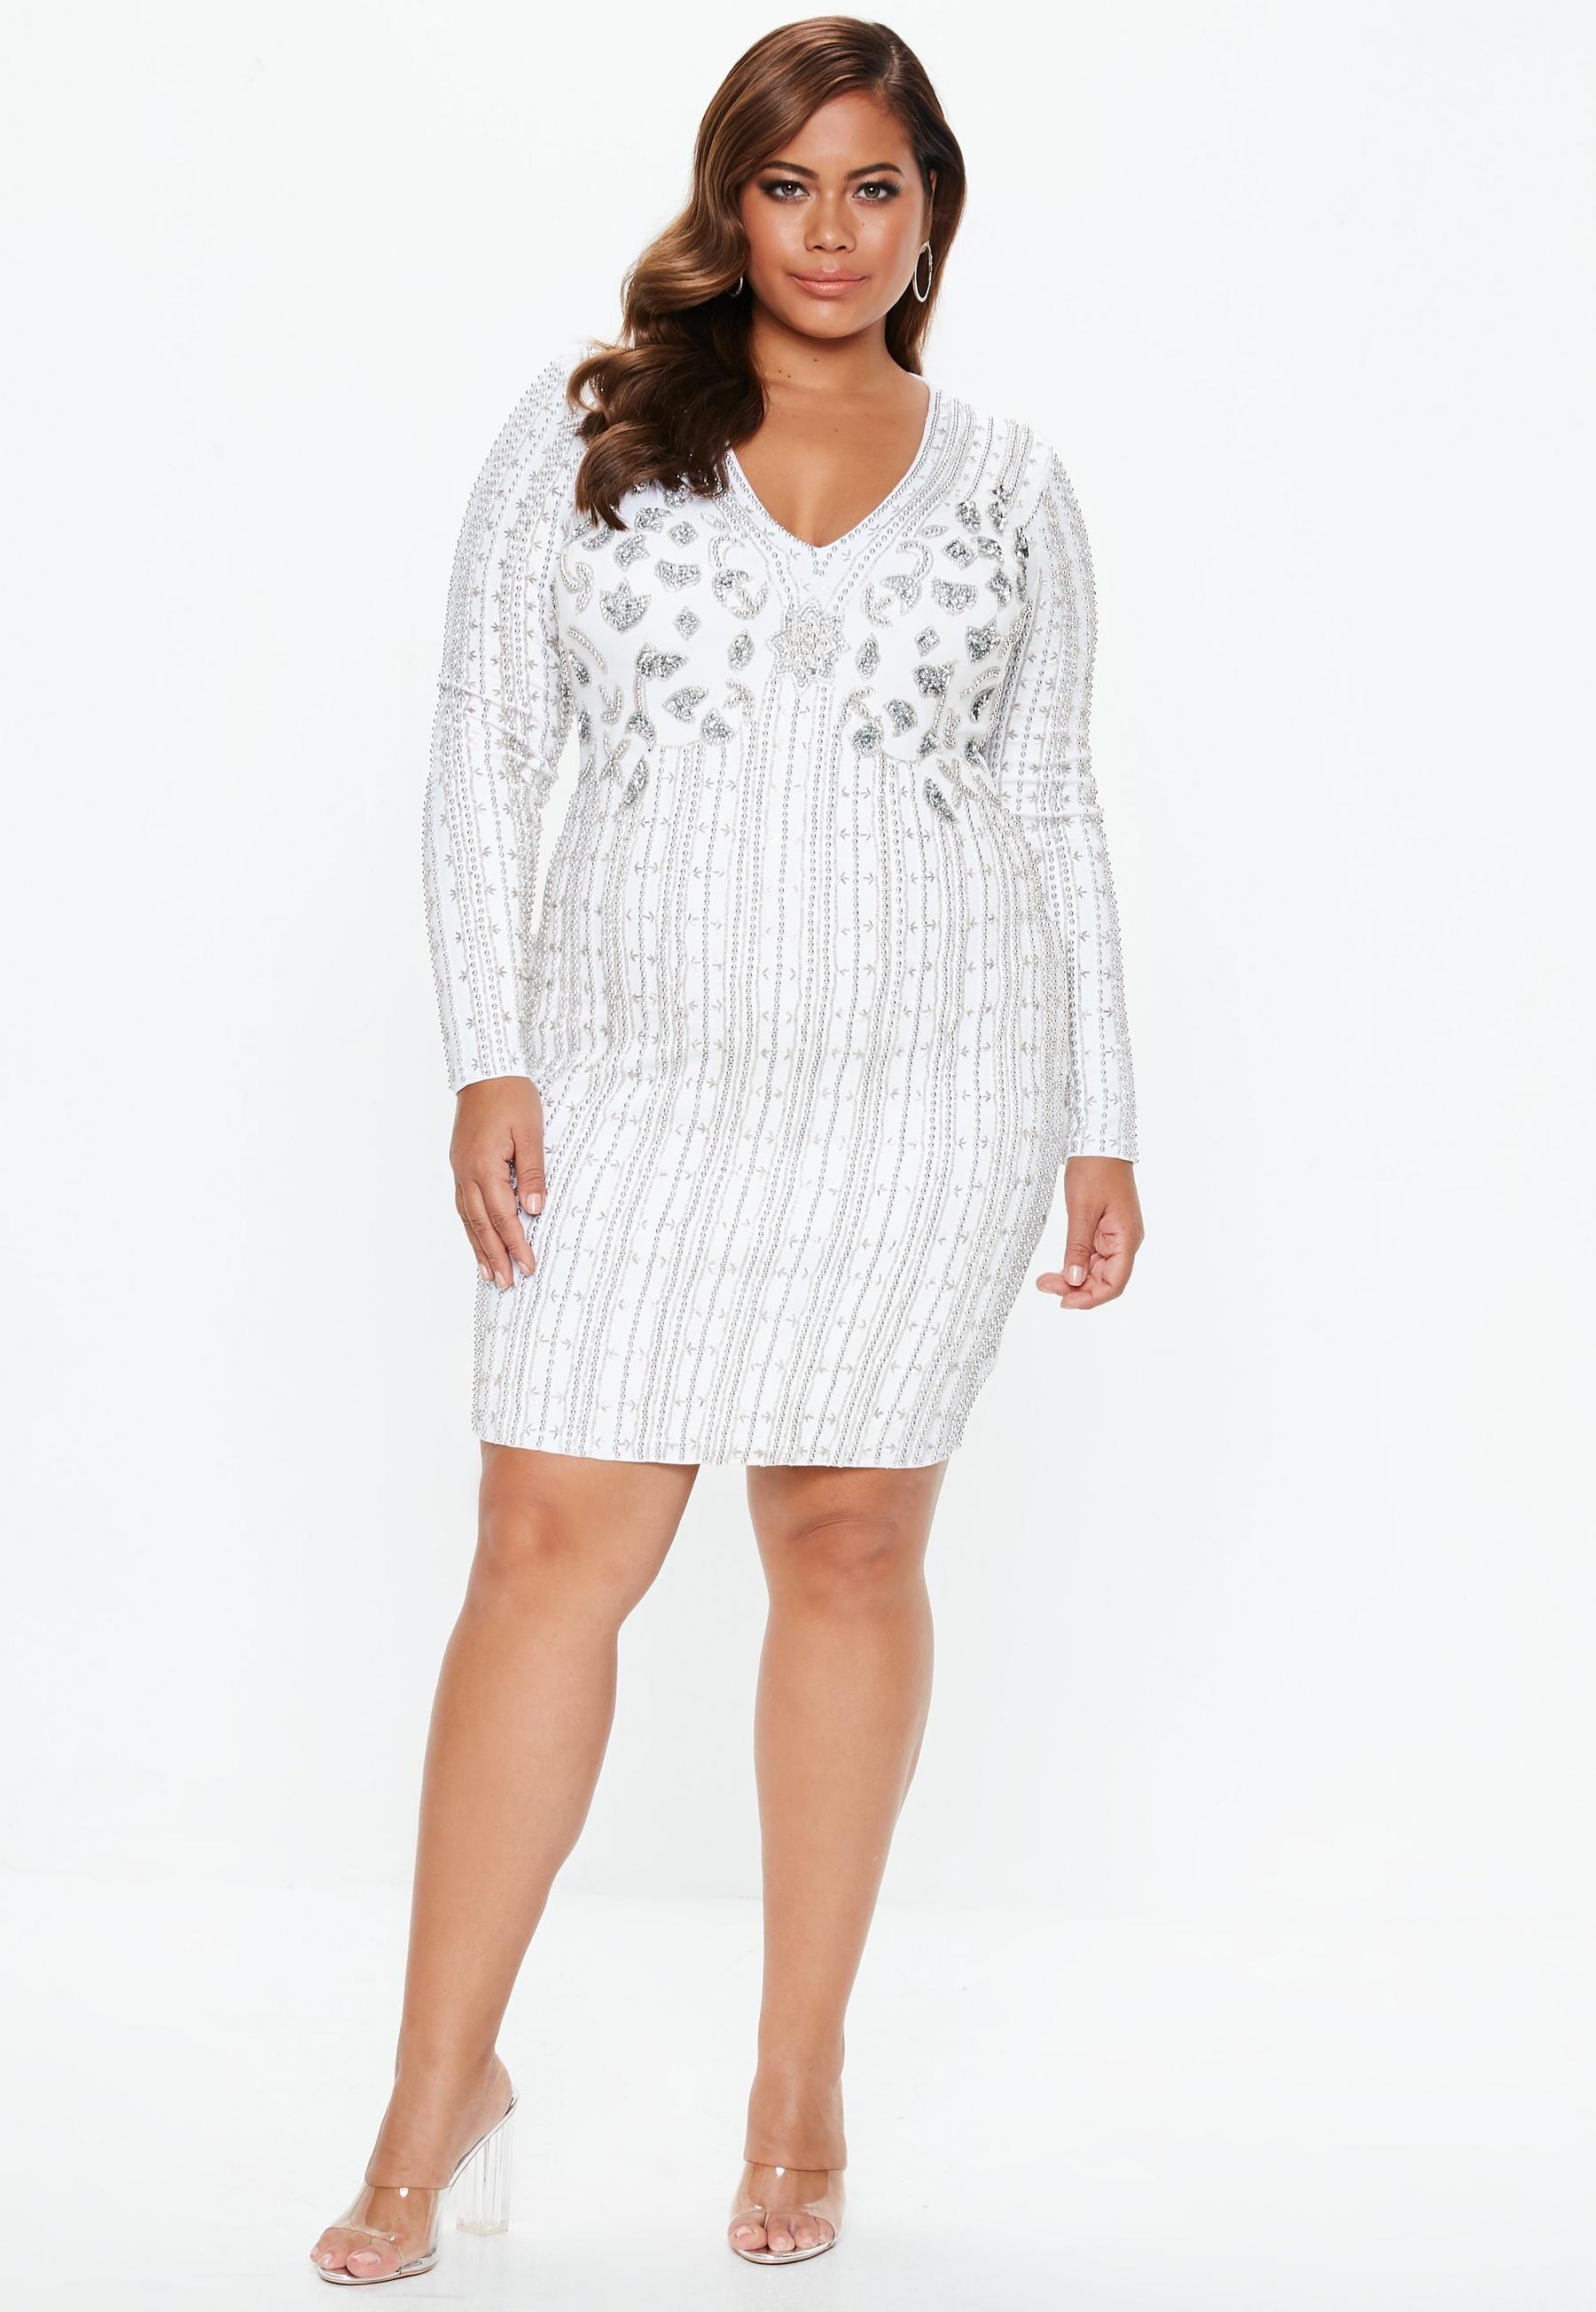 d5f64567c6 Plus Size White Embellished Mini Dress   Missguided   Catherine Li ...